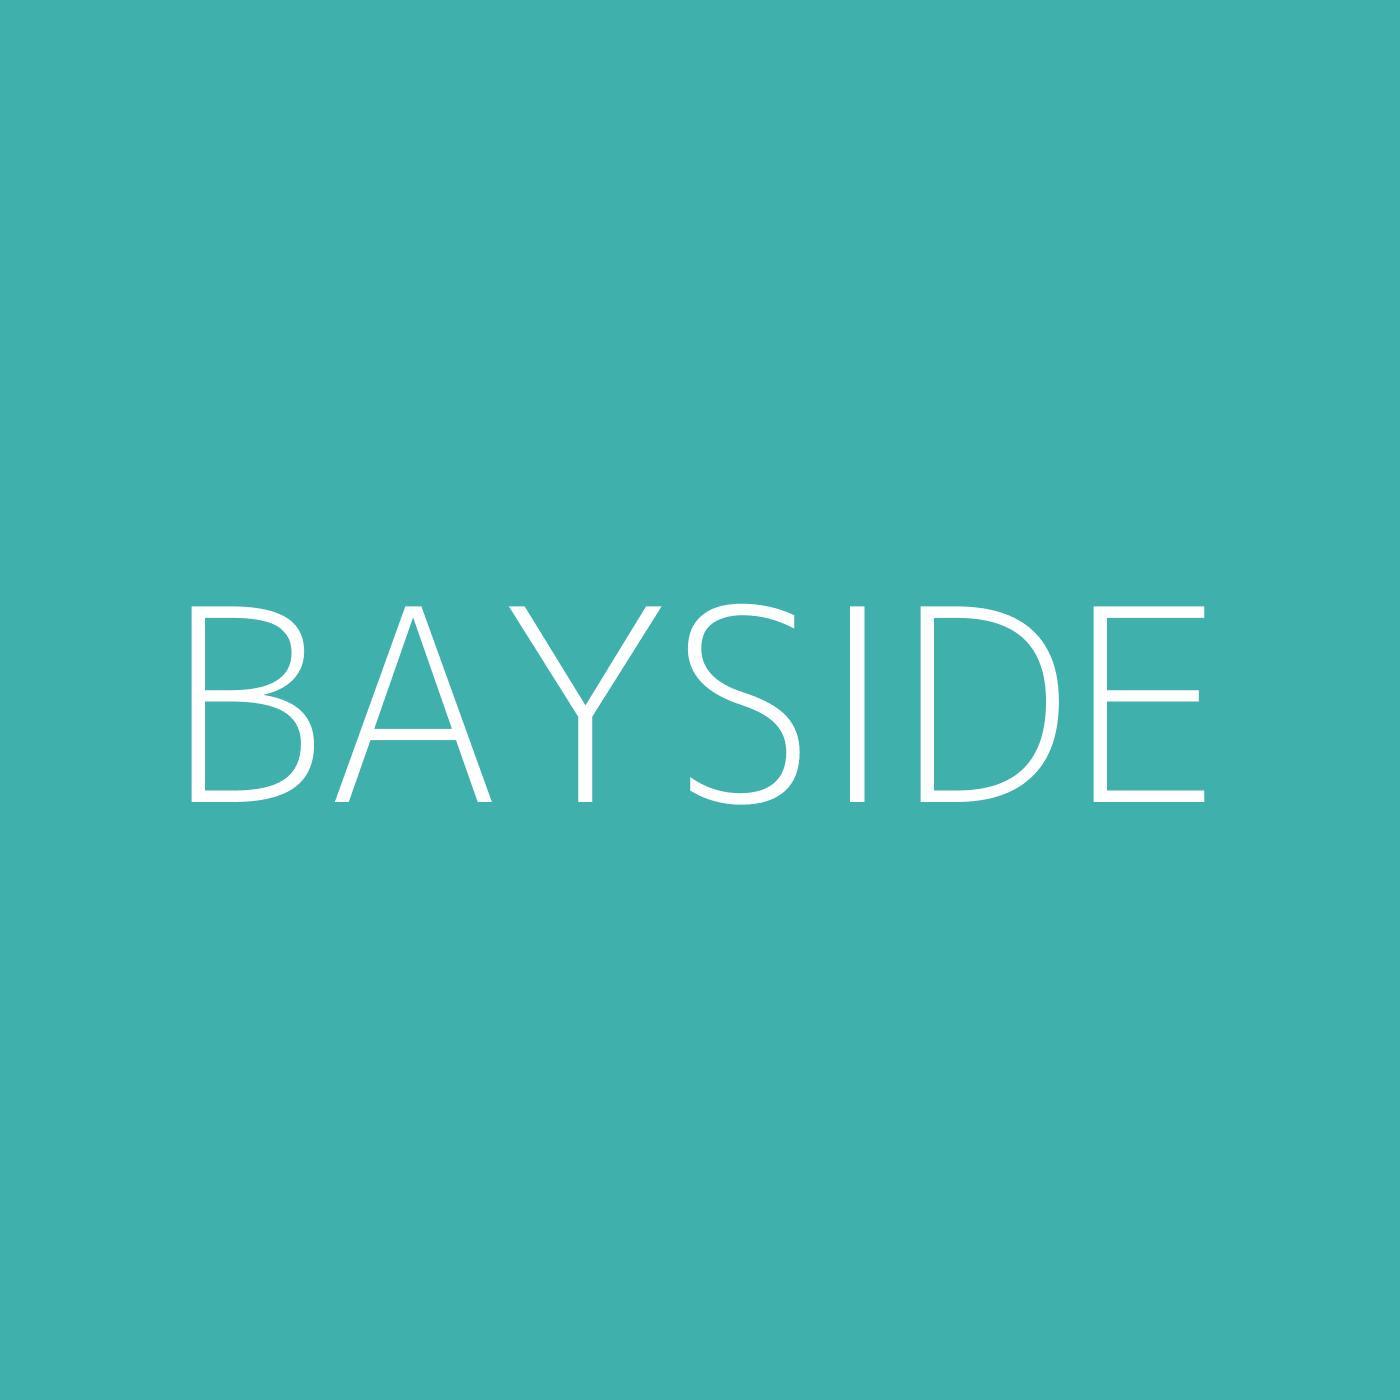 Bayside Playlist Artwork